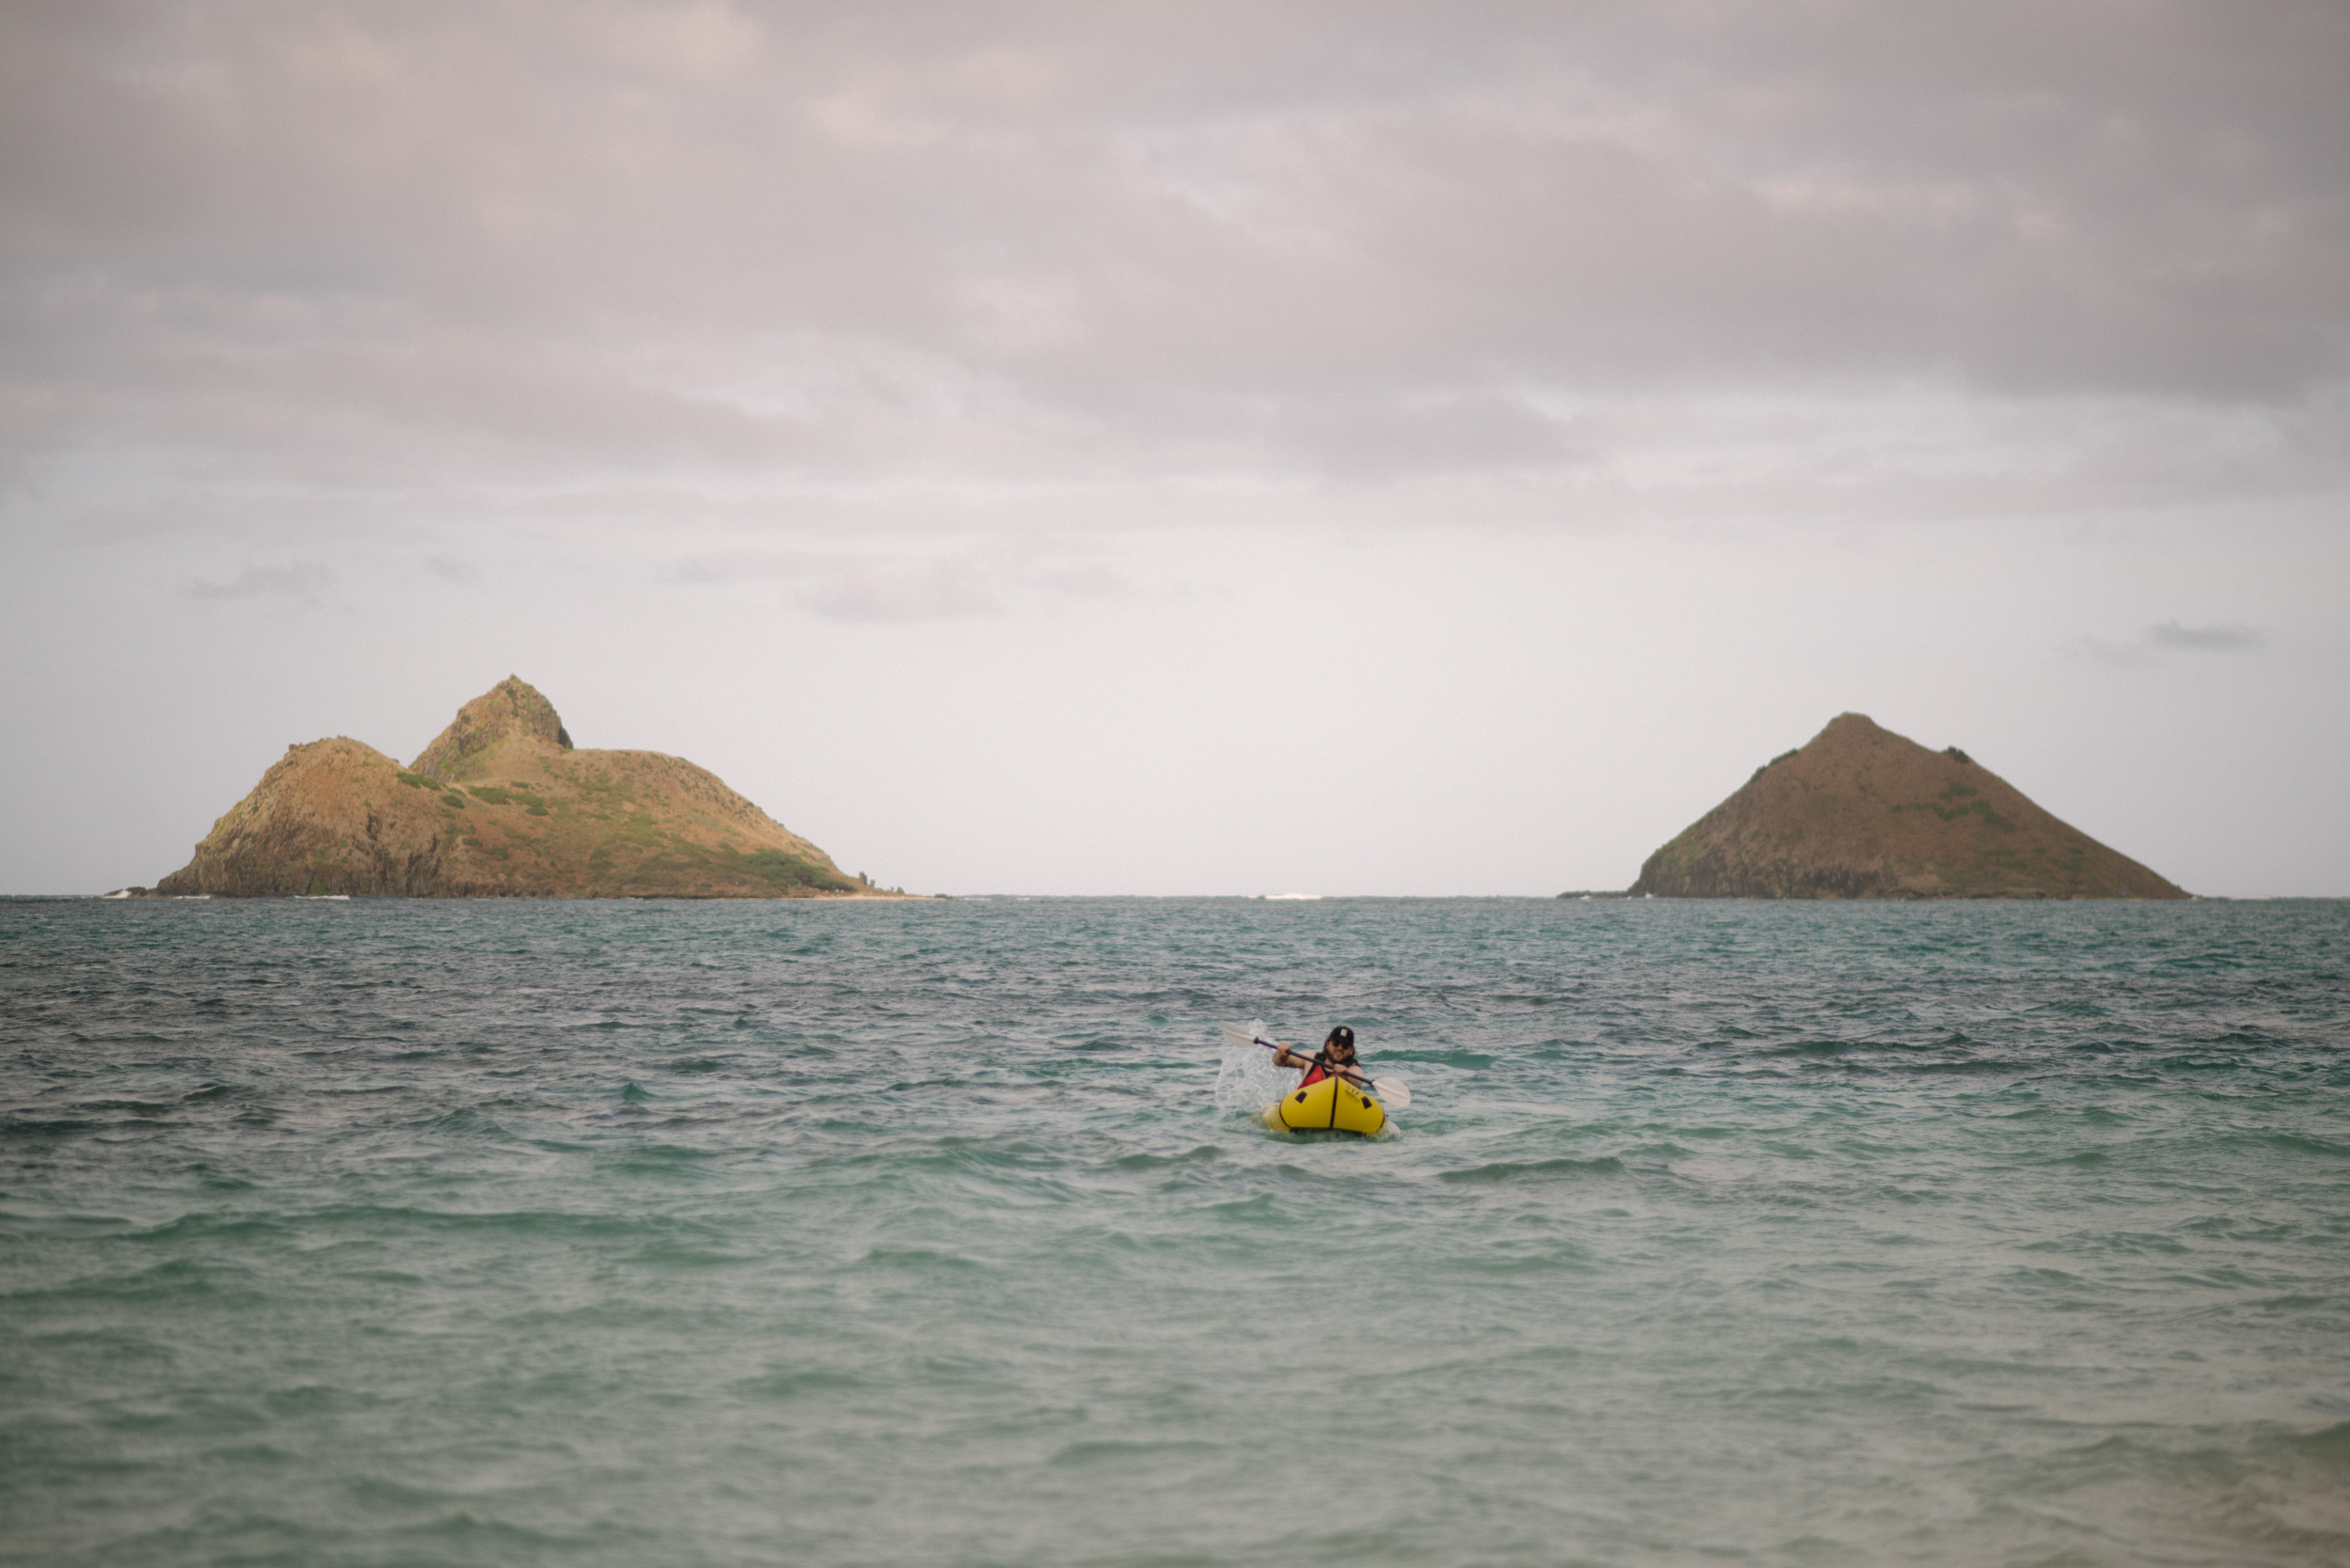 TannerWendellStewart_Brazil_Rogue_traveling_ocean_HighRes_1stPartyPrintDigital-89981.jpg